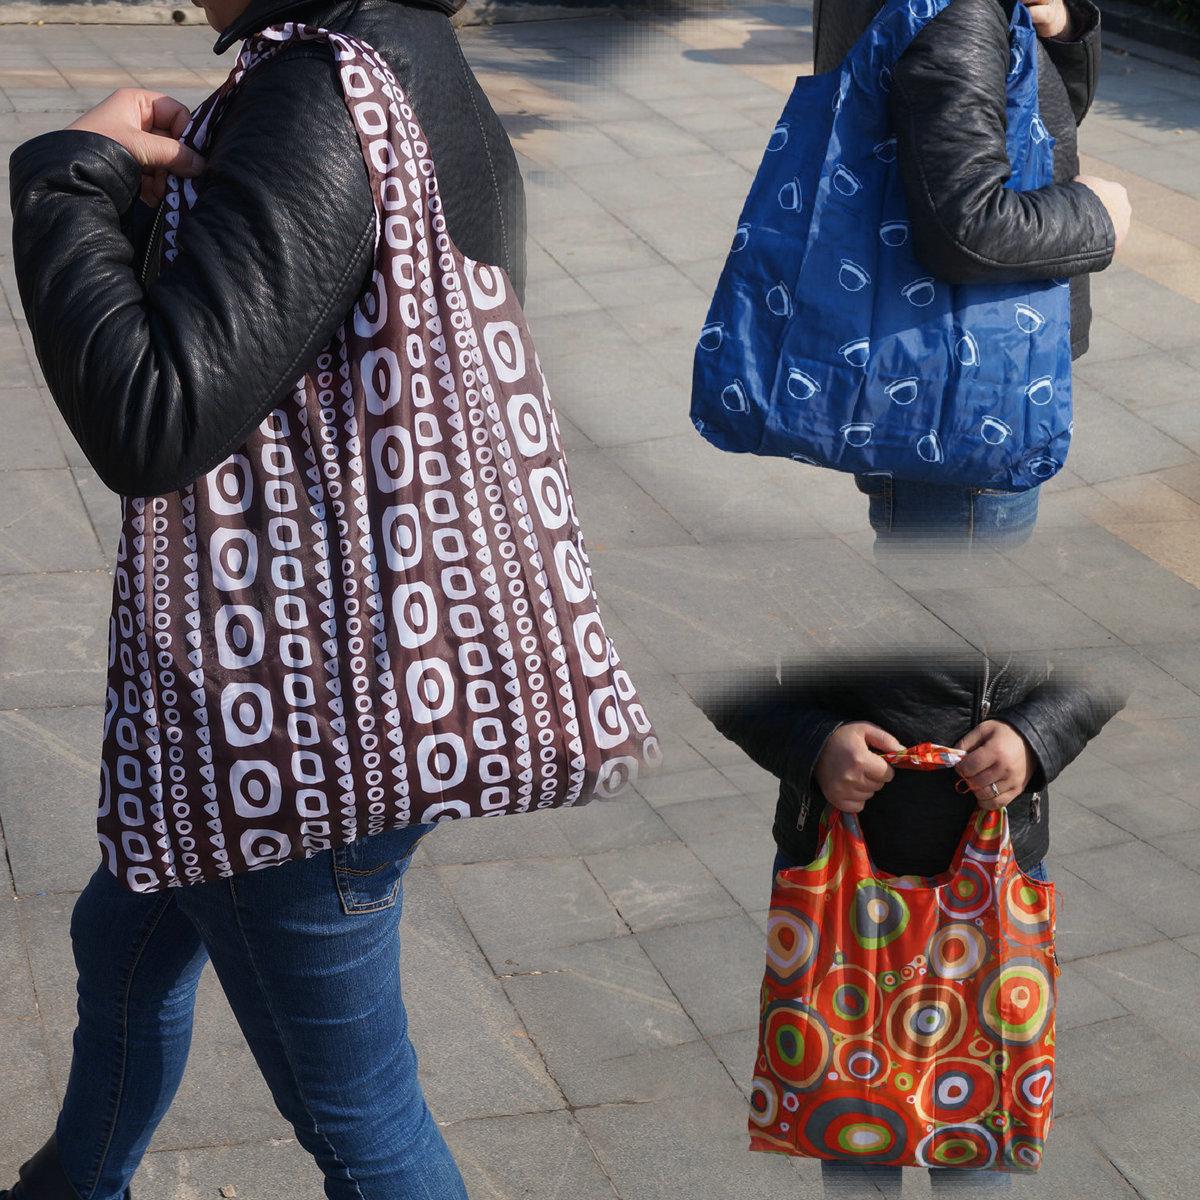 Fashion fashion outside folding shopping bags large capacity supermarket shopping bags portable environmental protection bags 10kg load bearing